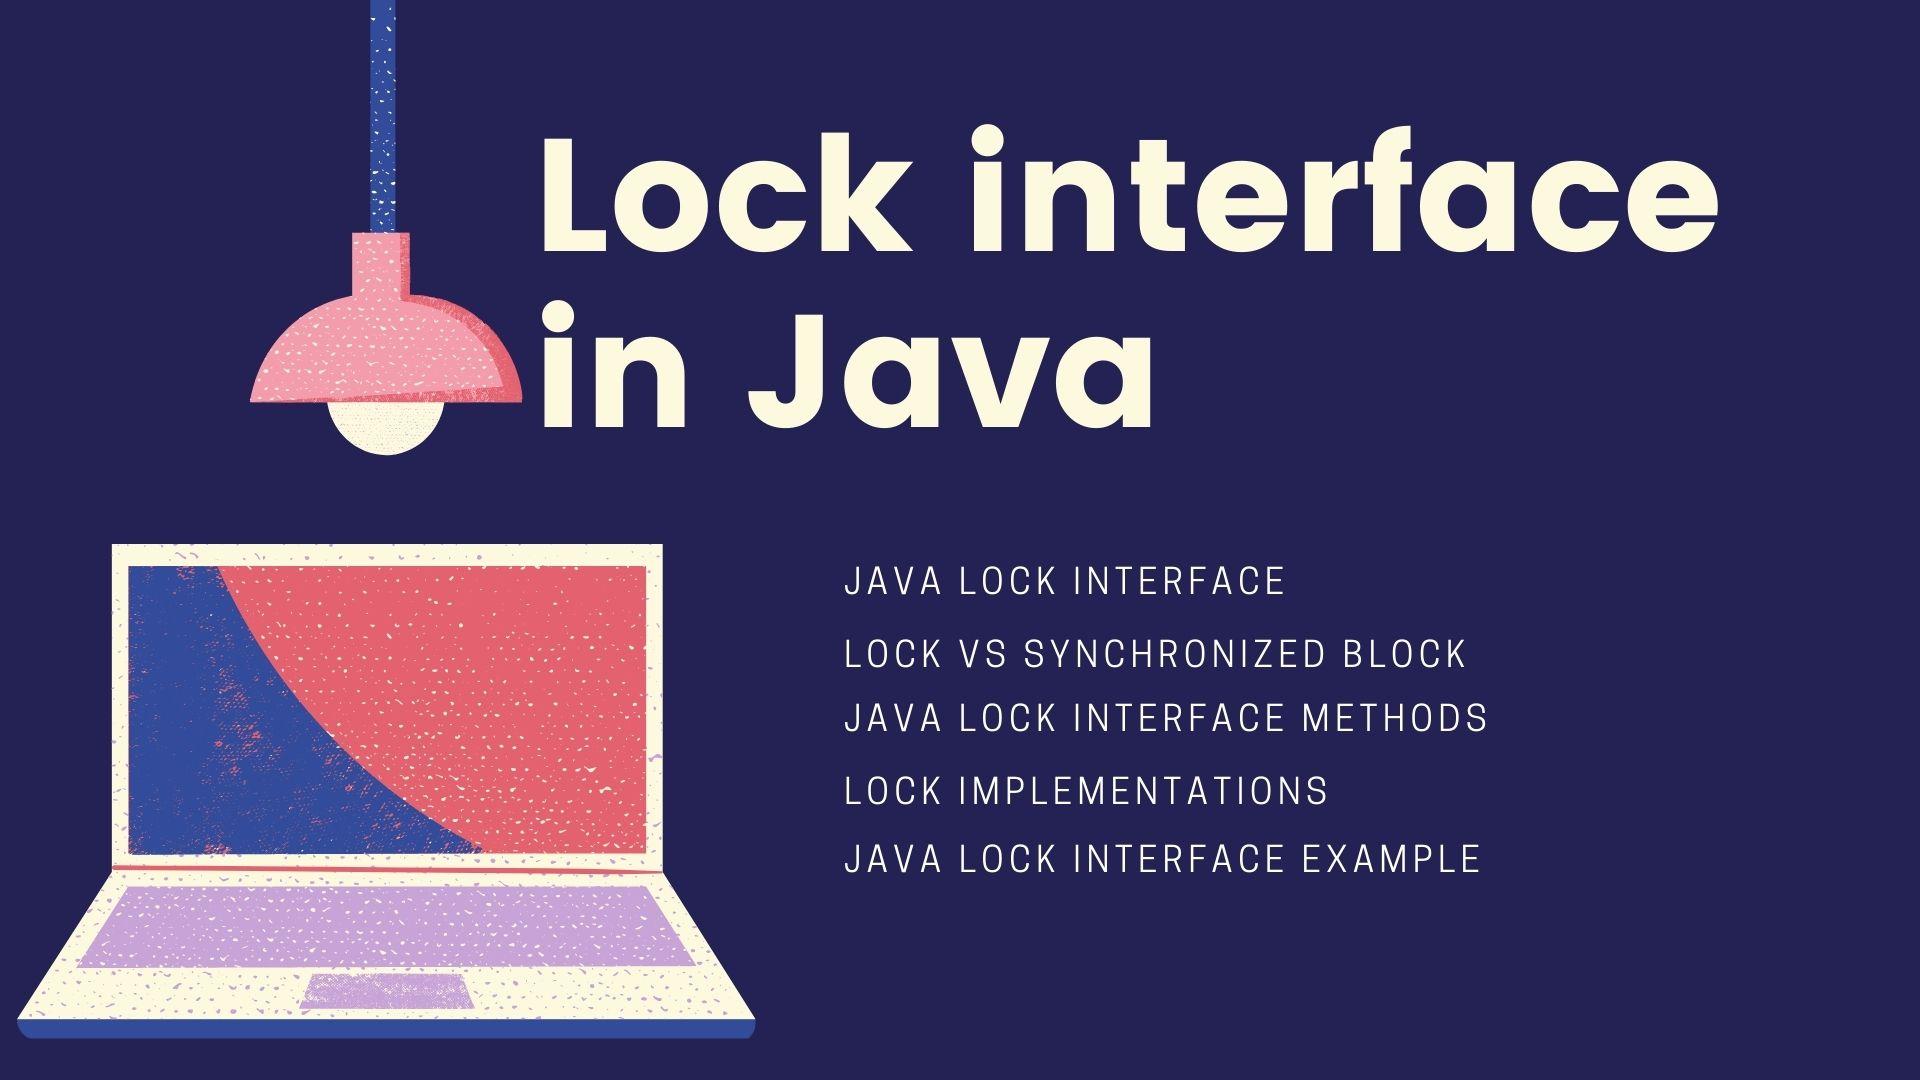 Lock interface in Java